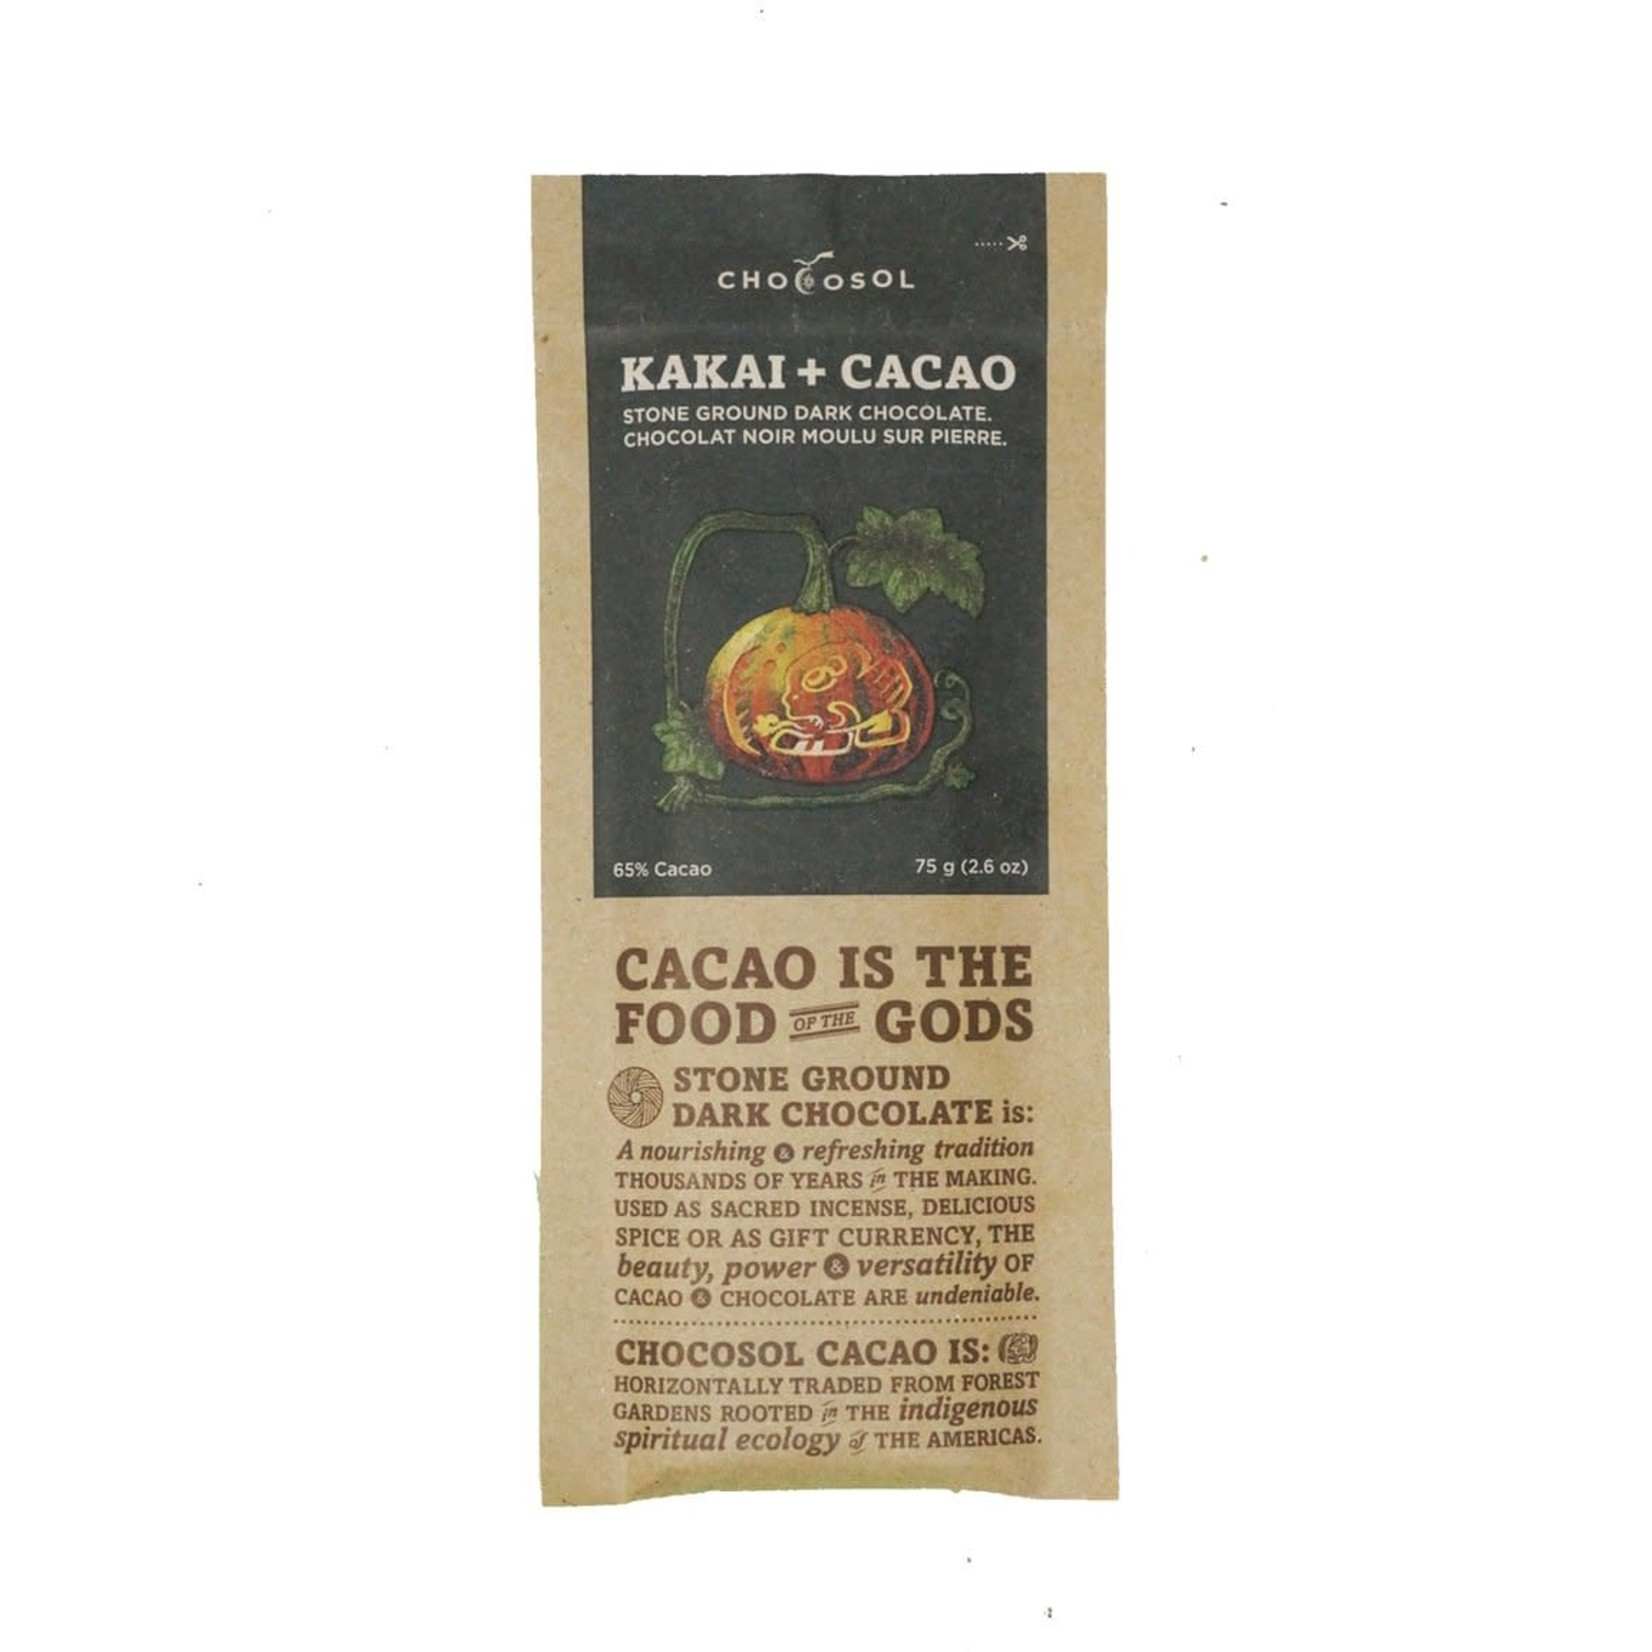 Chocosol Kakai + Cacao